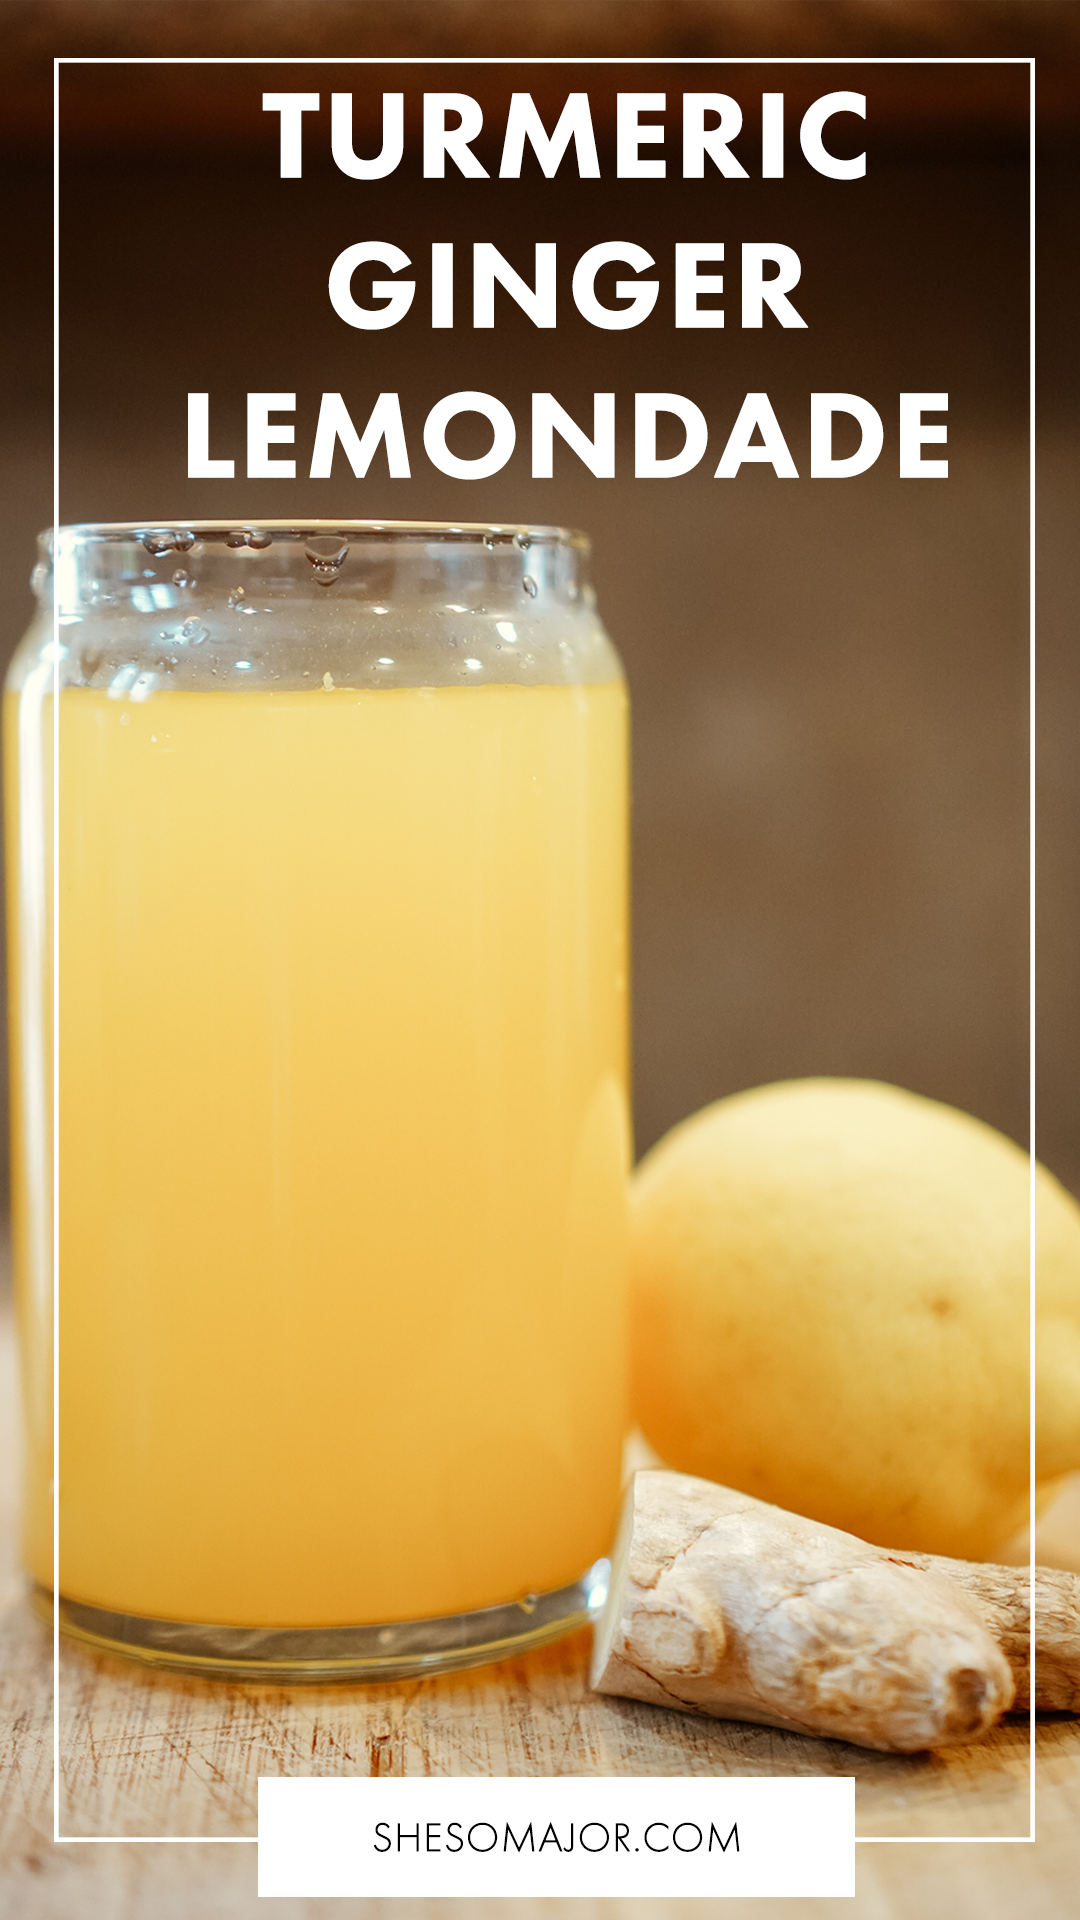 Something Delicious: Turmeric Ginger Lemonade